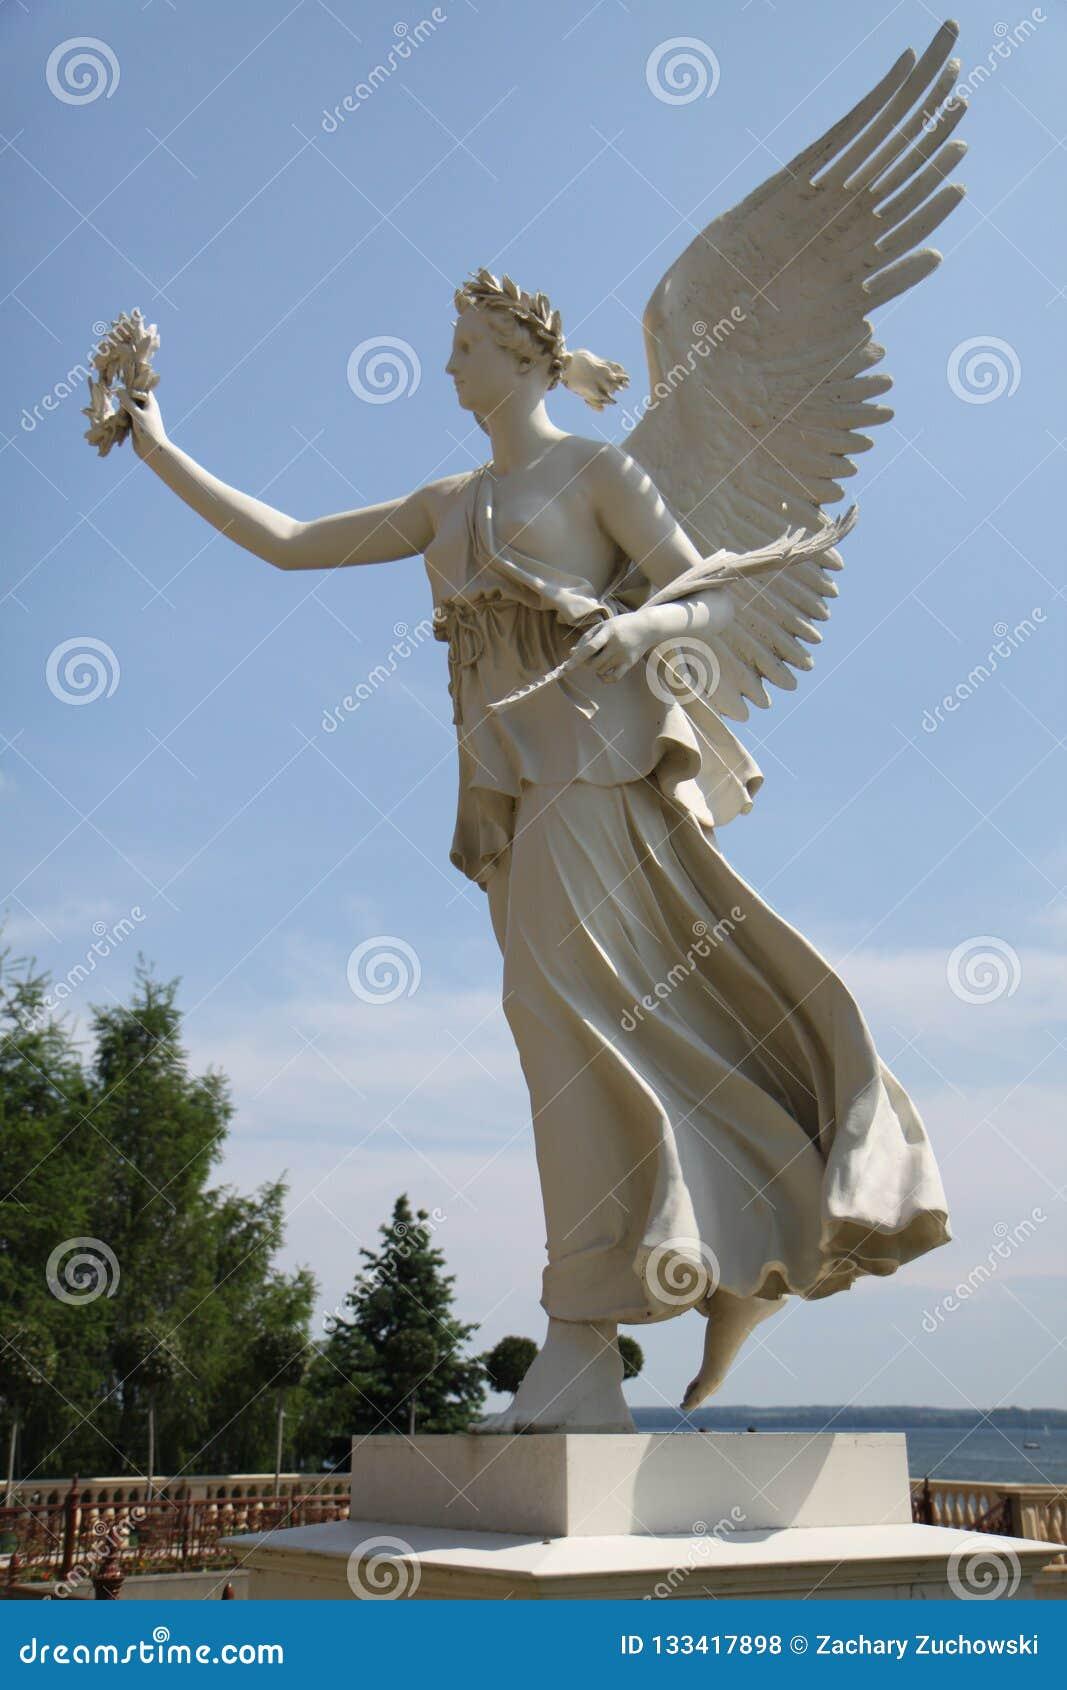 Un ángel en un pedestal cerca del agua